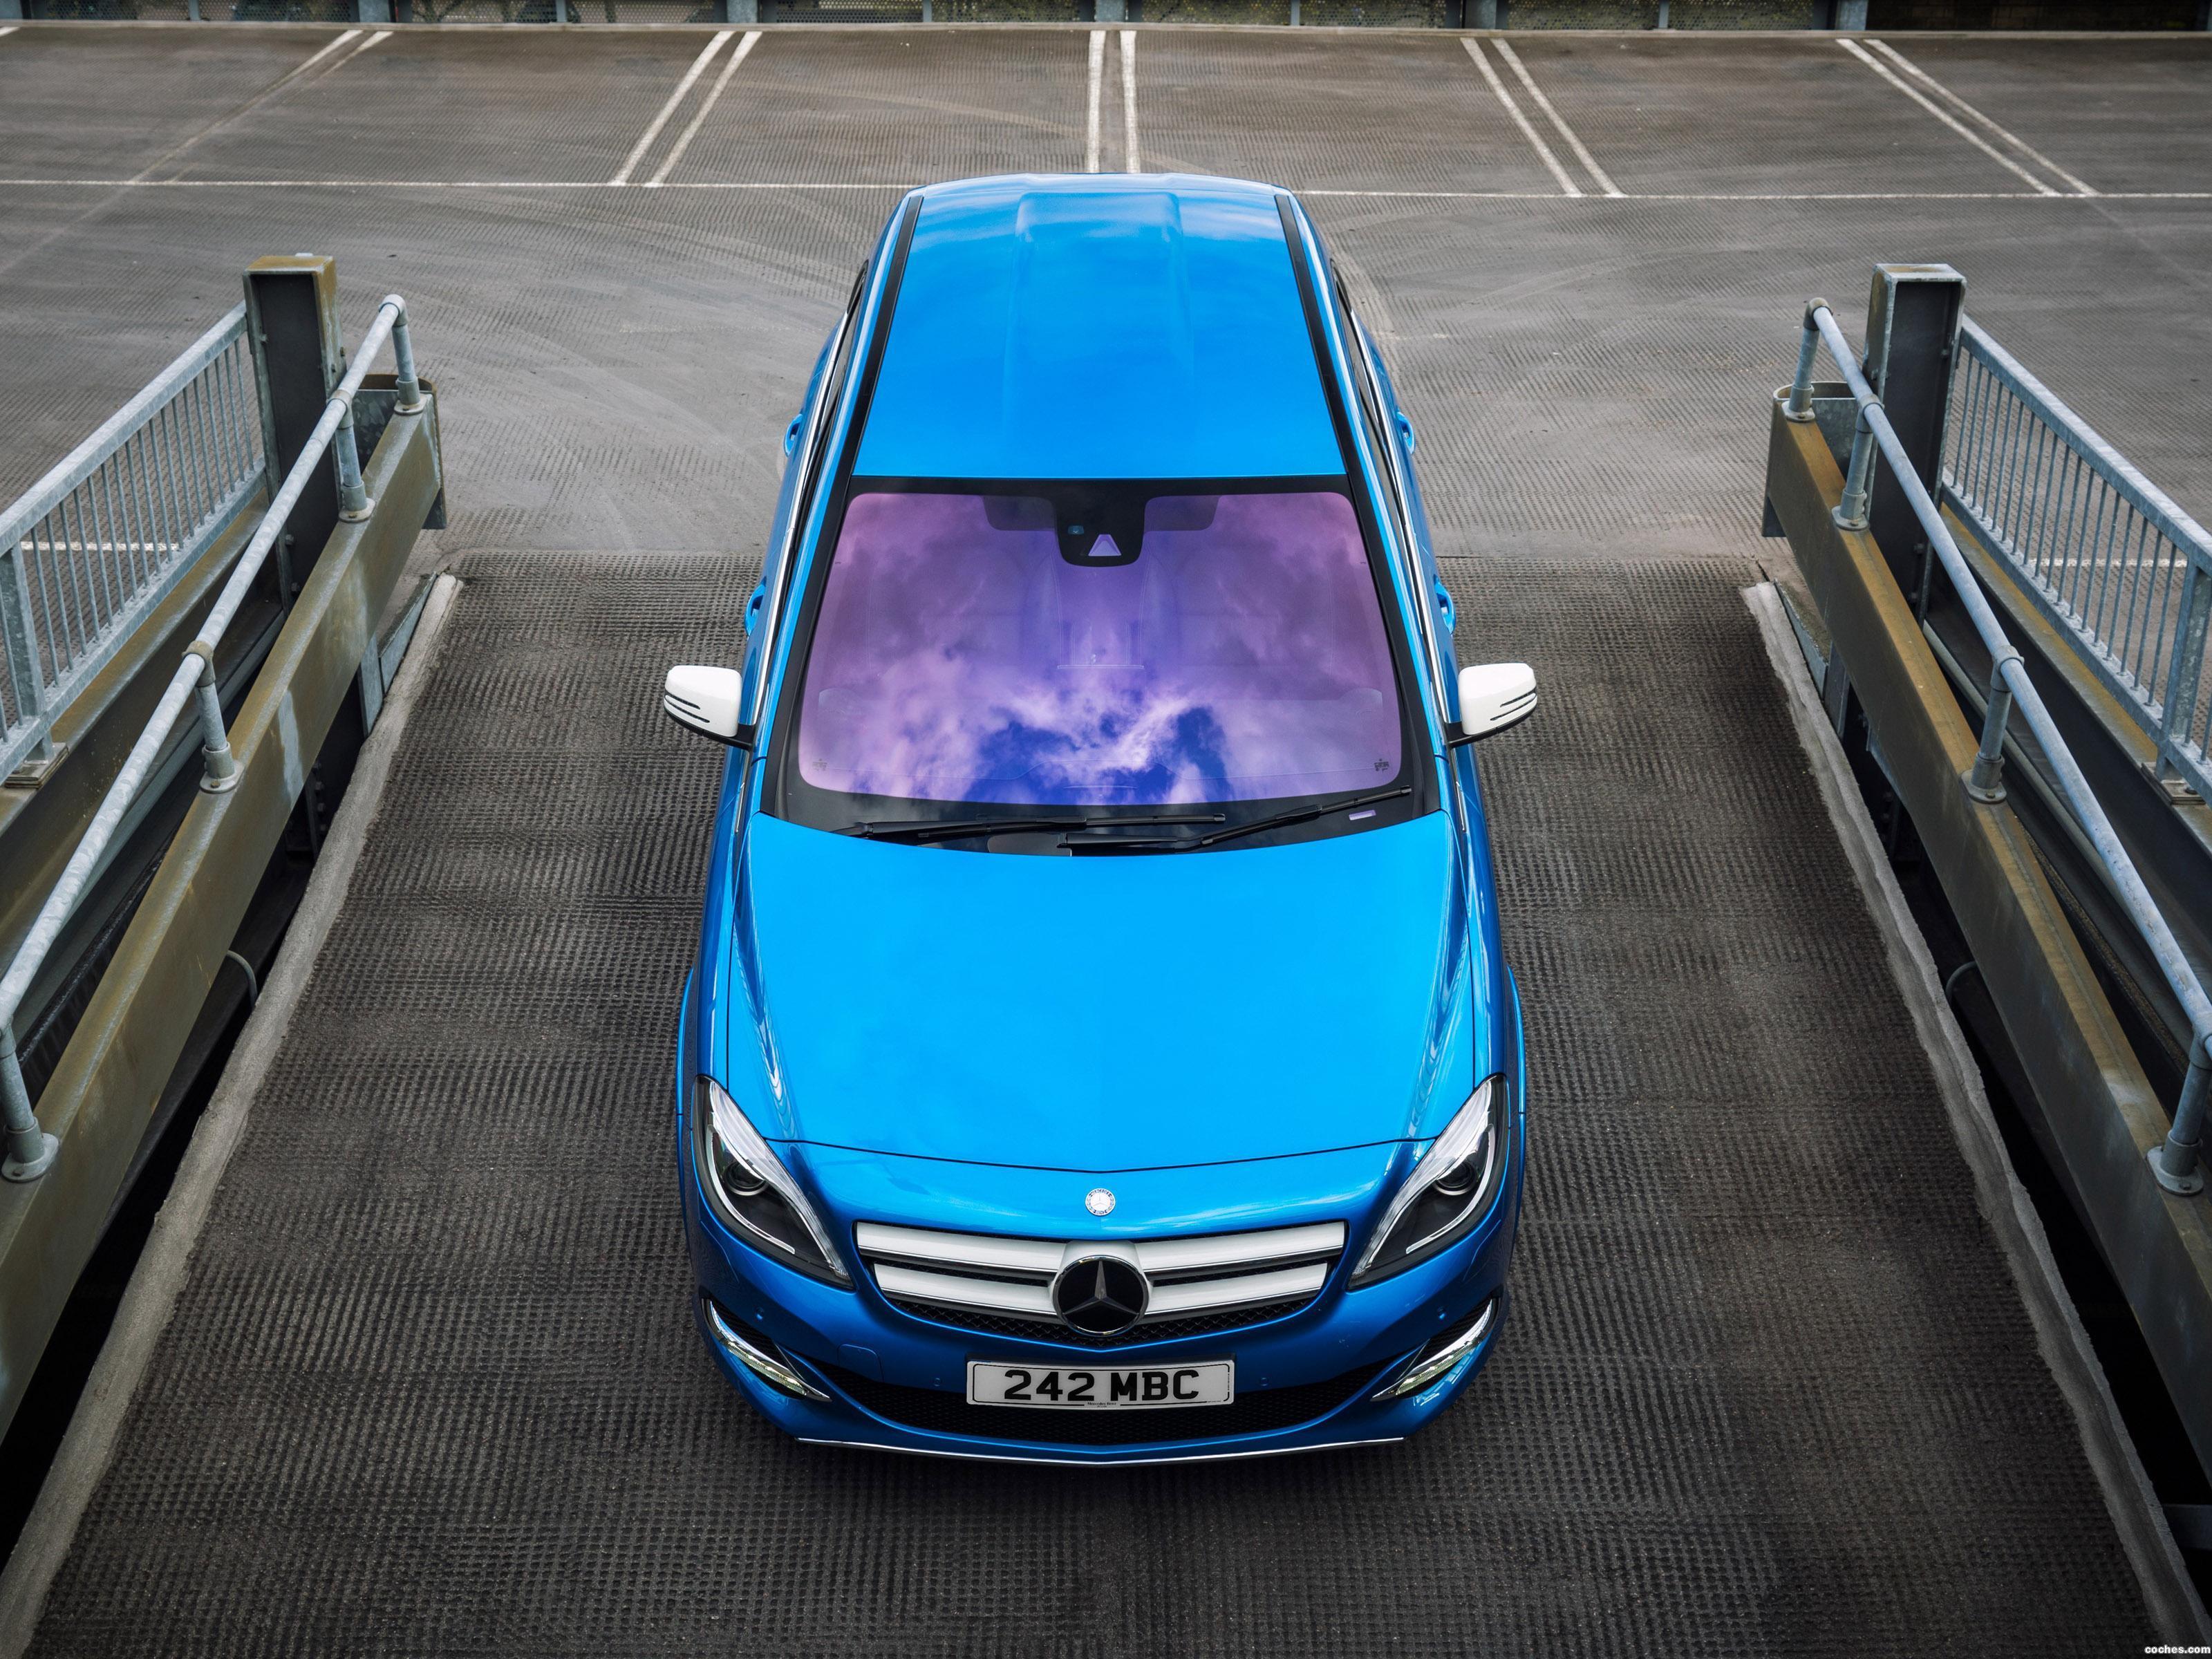 mercedes_b-klasse-electric-drive-w242-uk-2015_r18.jpg